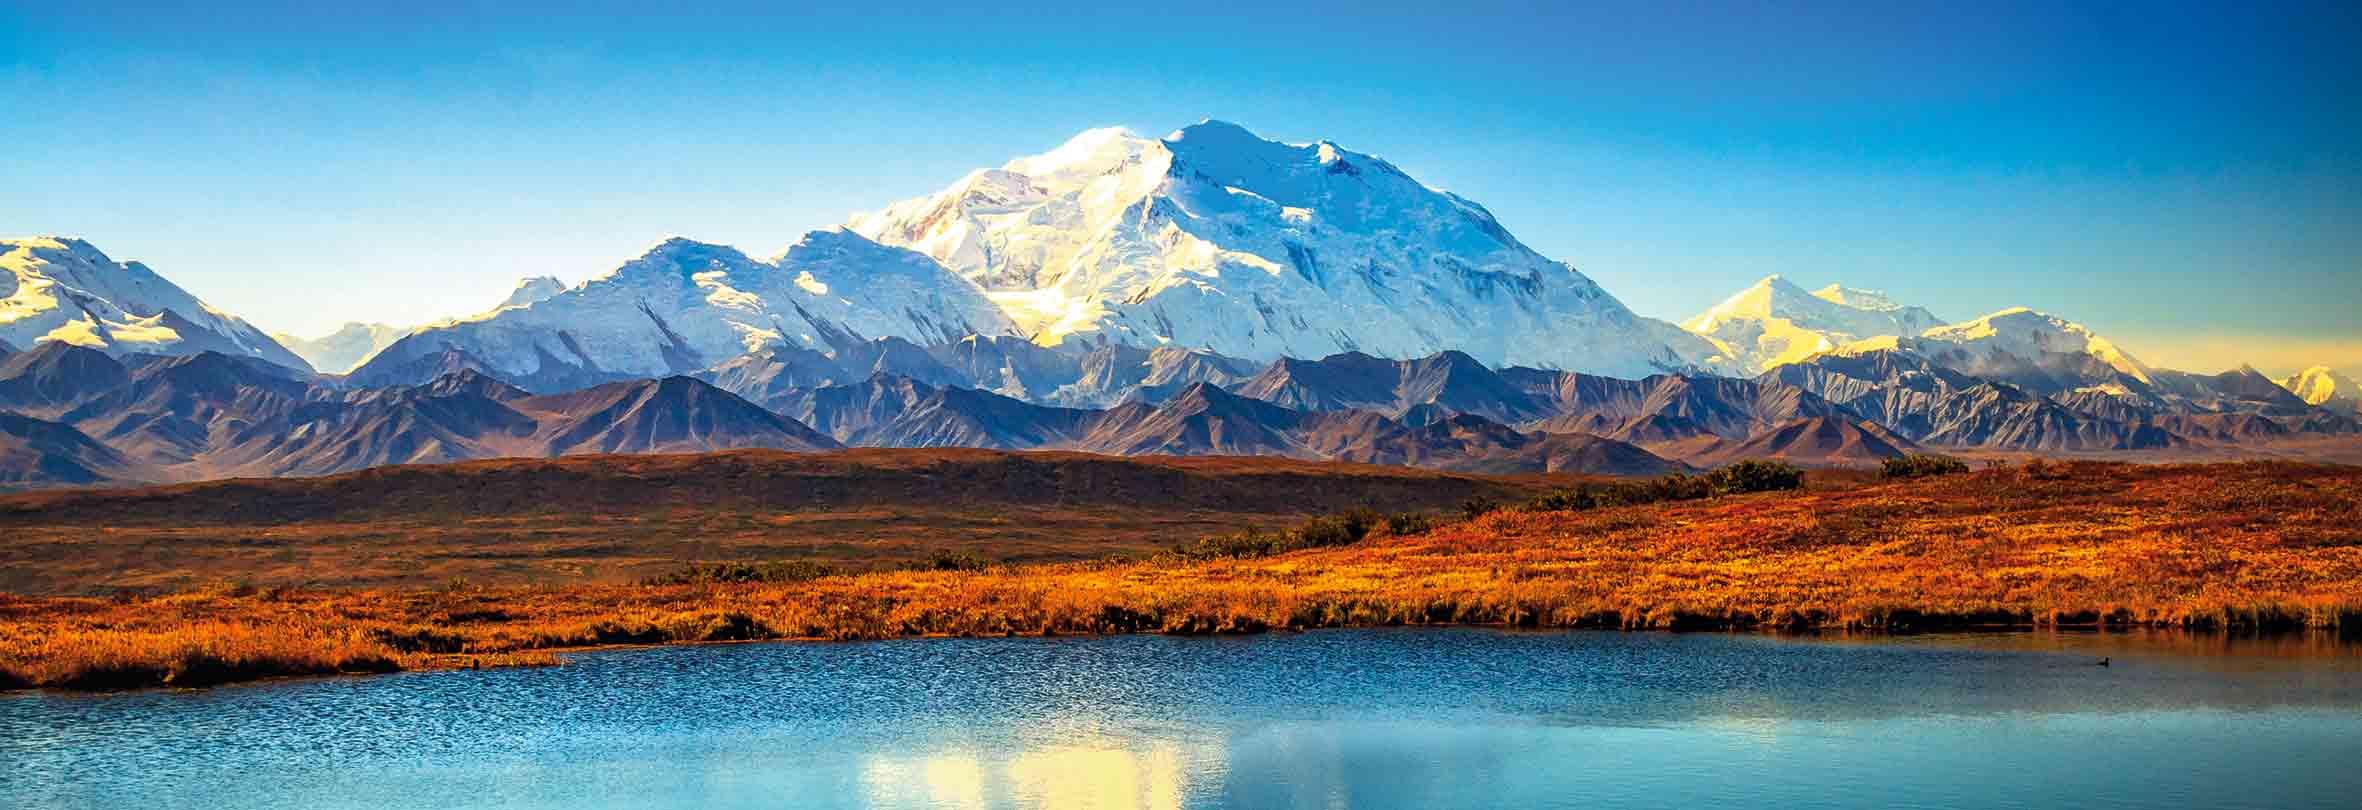 Denali, 6190 m, Alaska